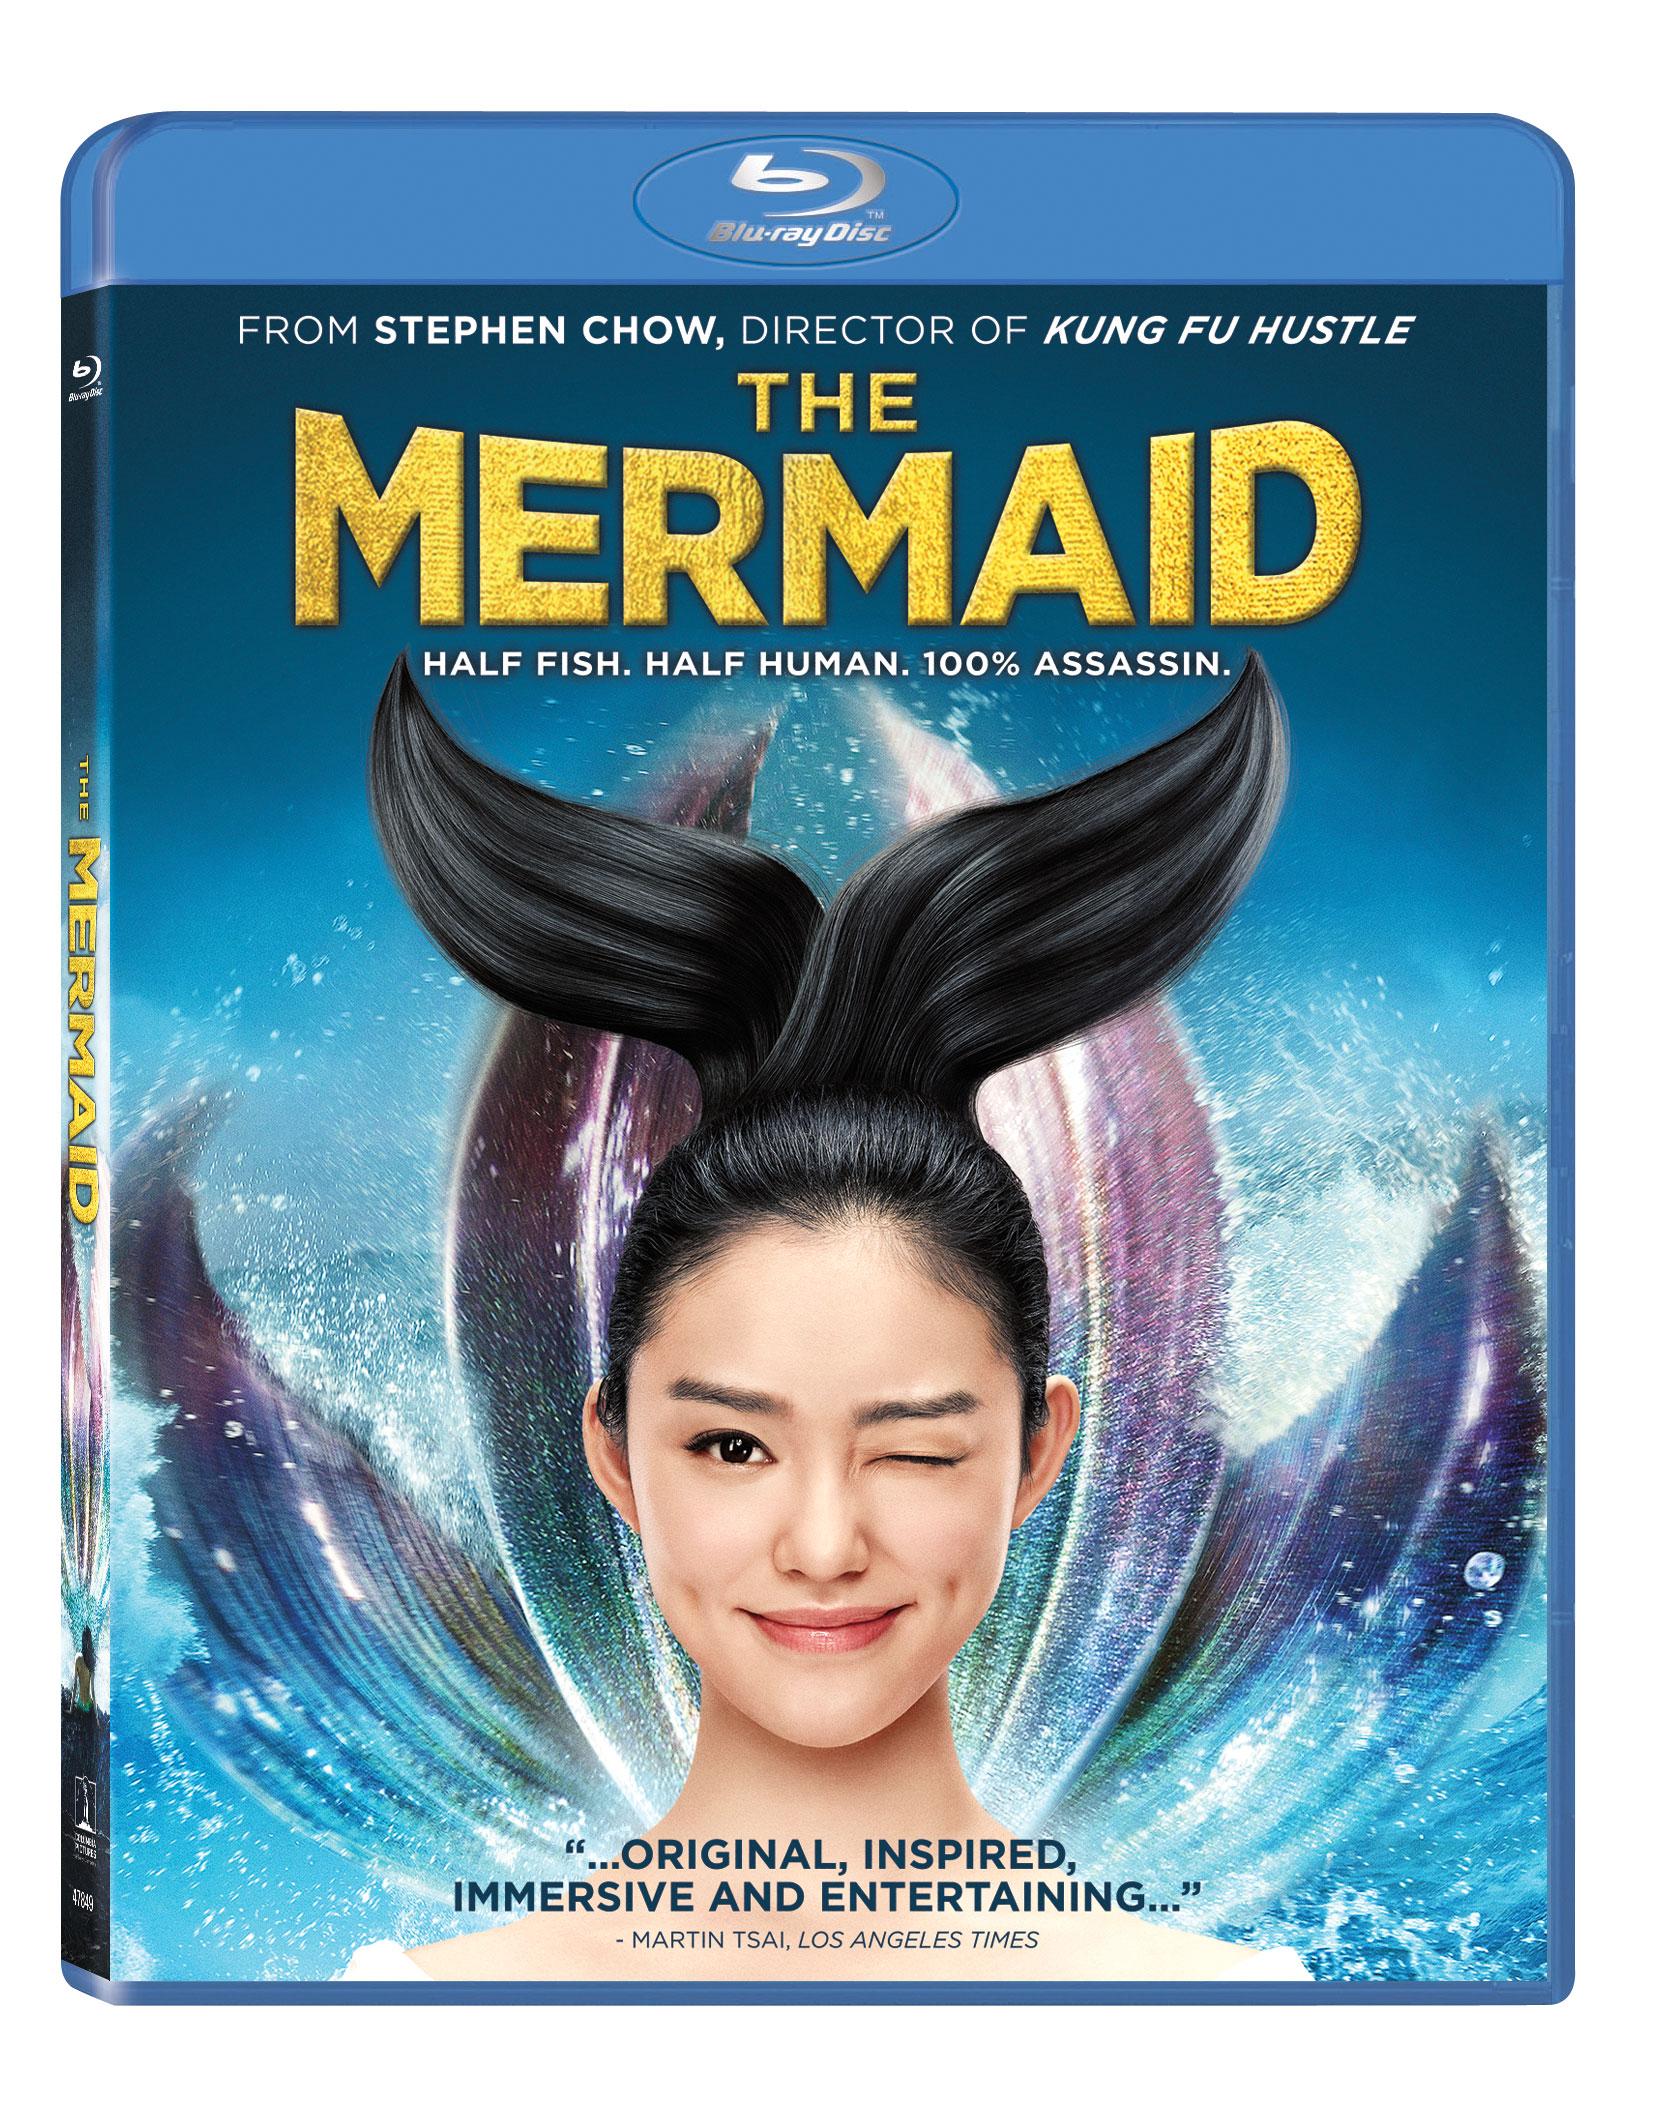 THE MERMAID Blu-ray